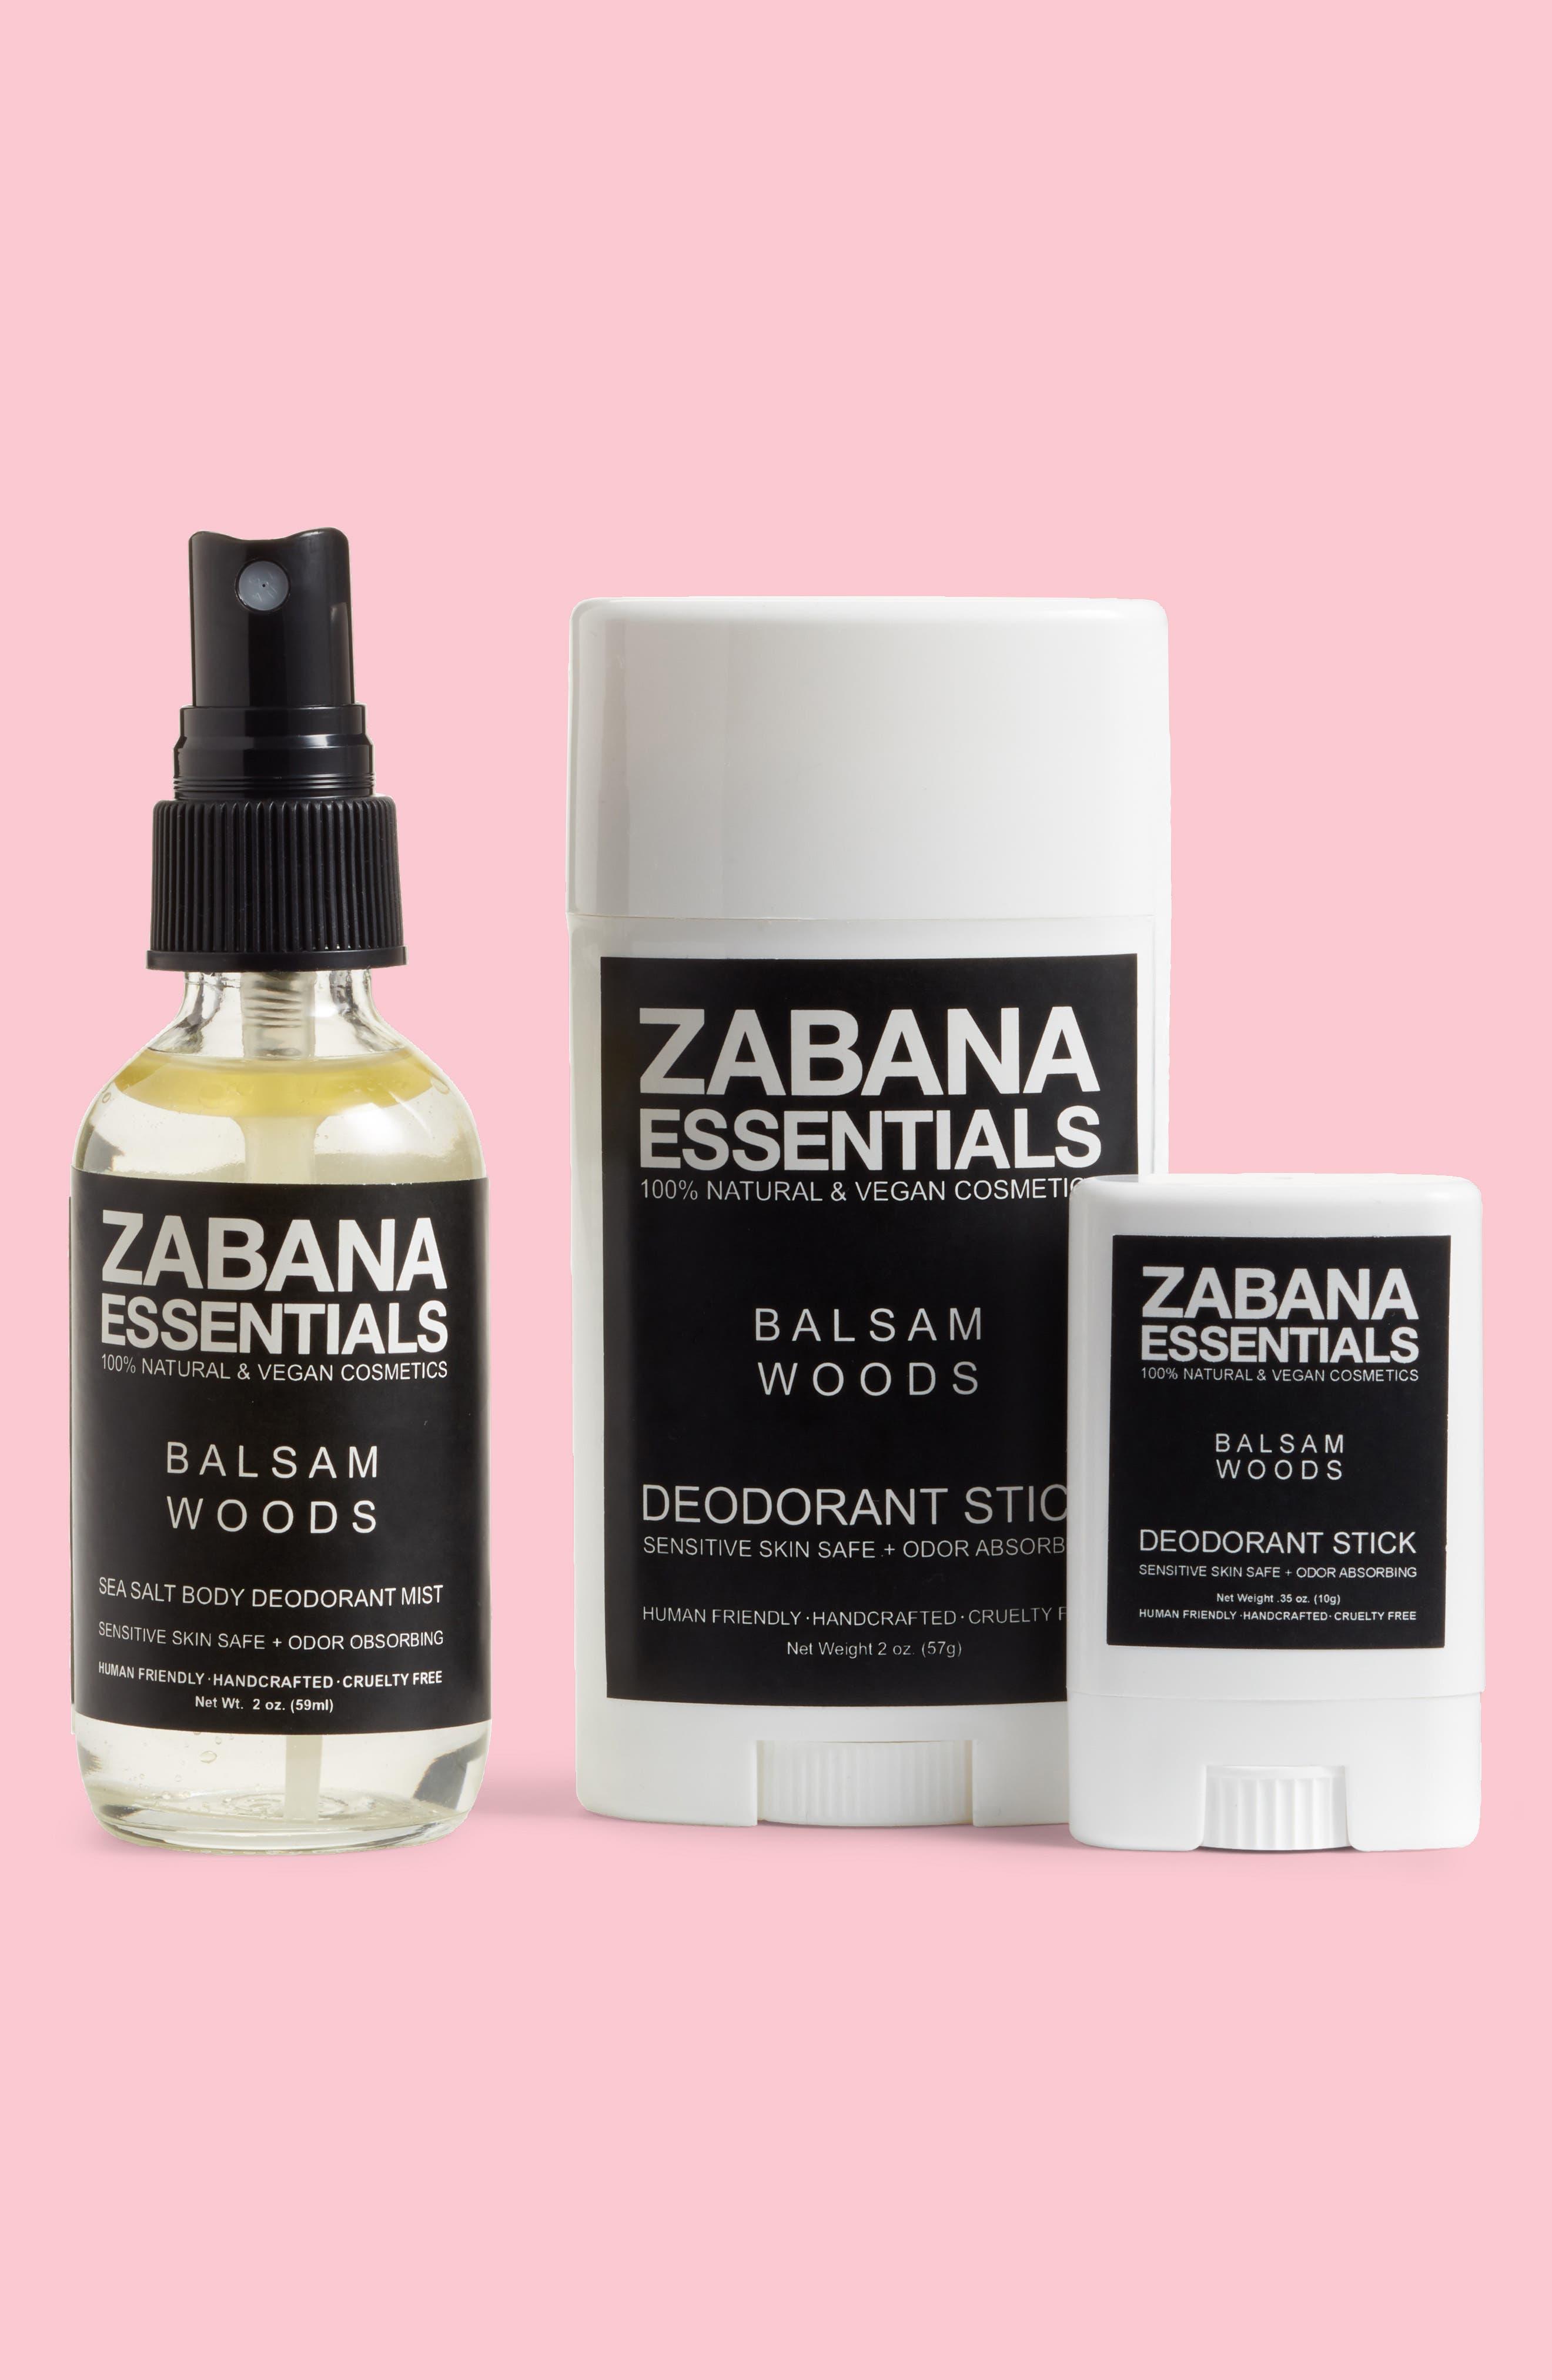 ZABANA ESSENTIALS Balsam Woods Deodorant Set, Main, color, 200